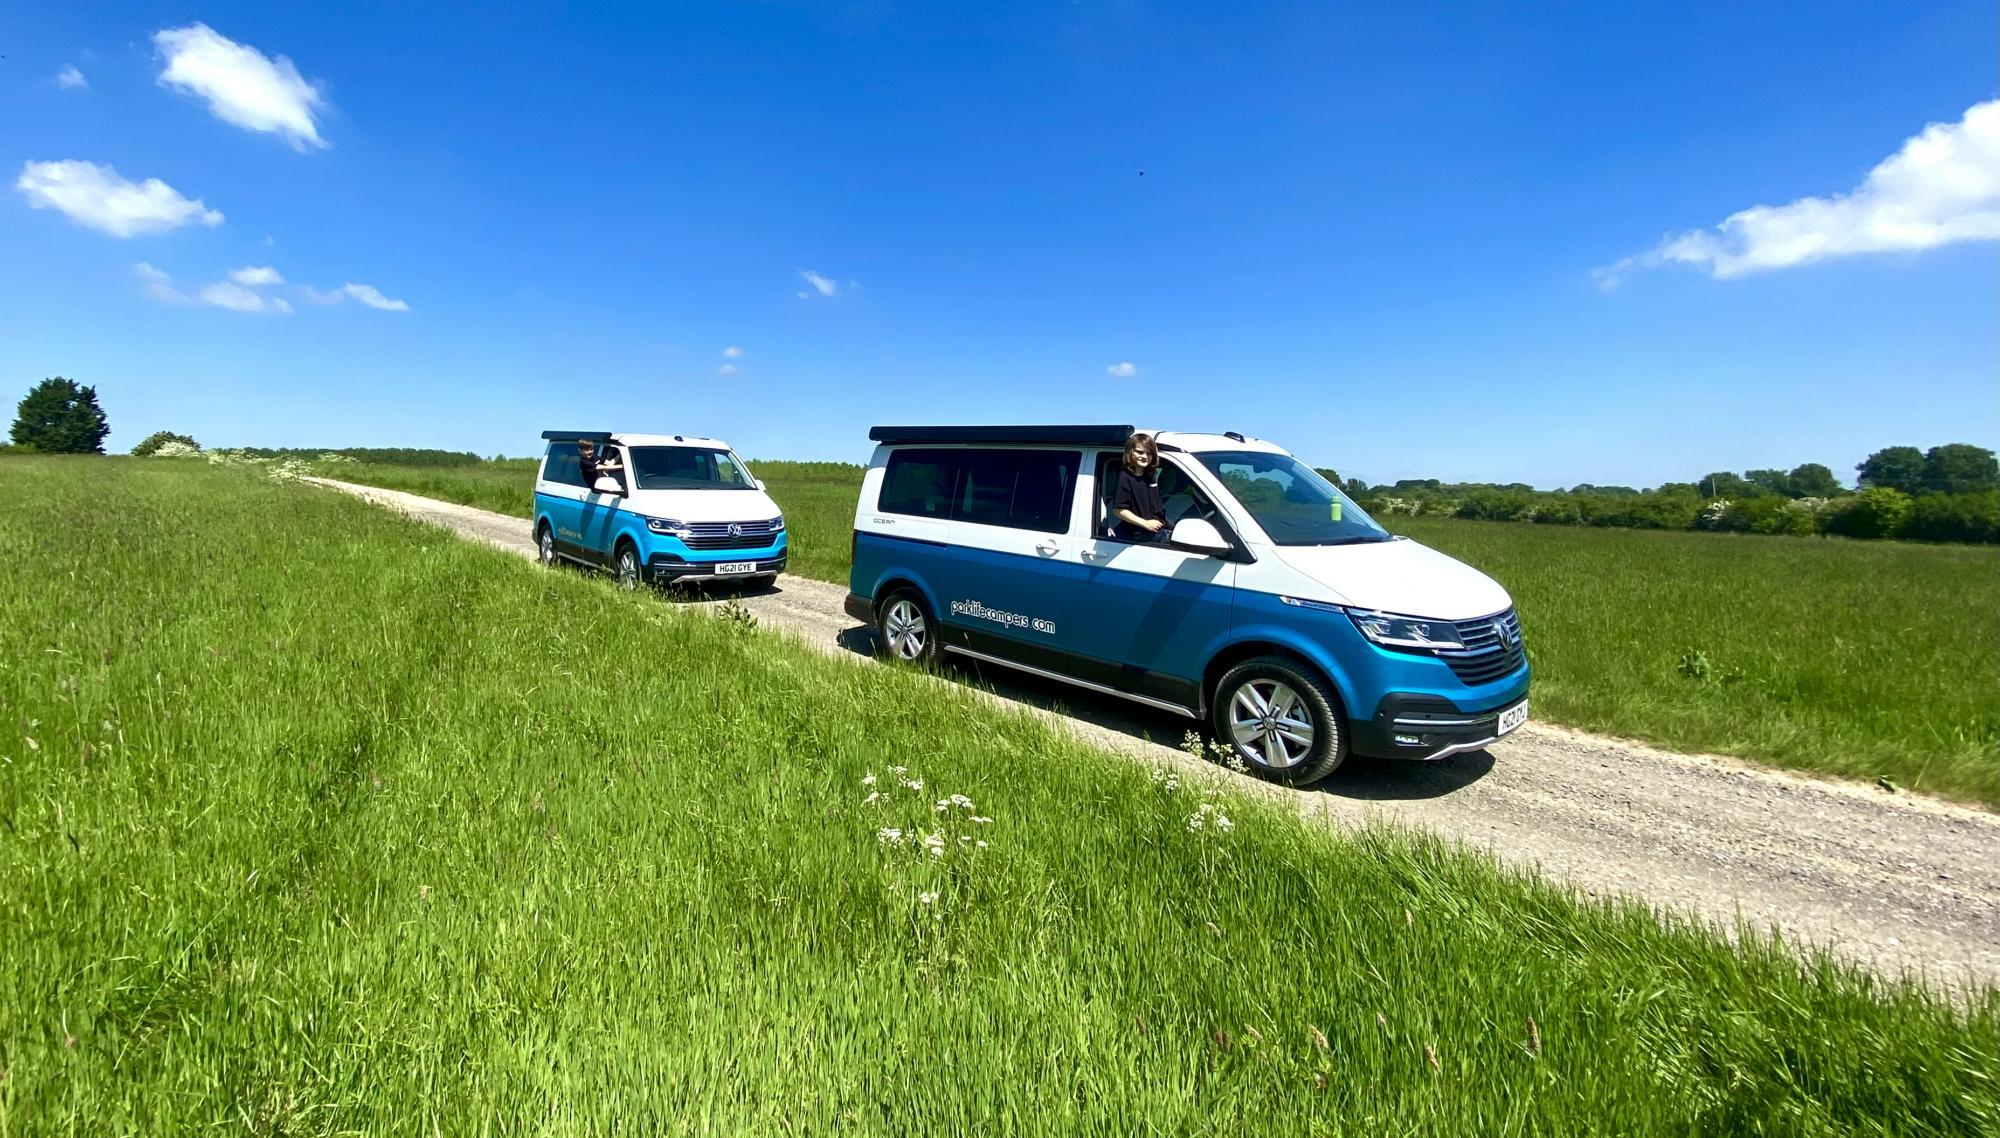 Campervan Hire and Motorhome Rental in Buckinghamshire – Cool Camping